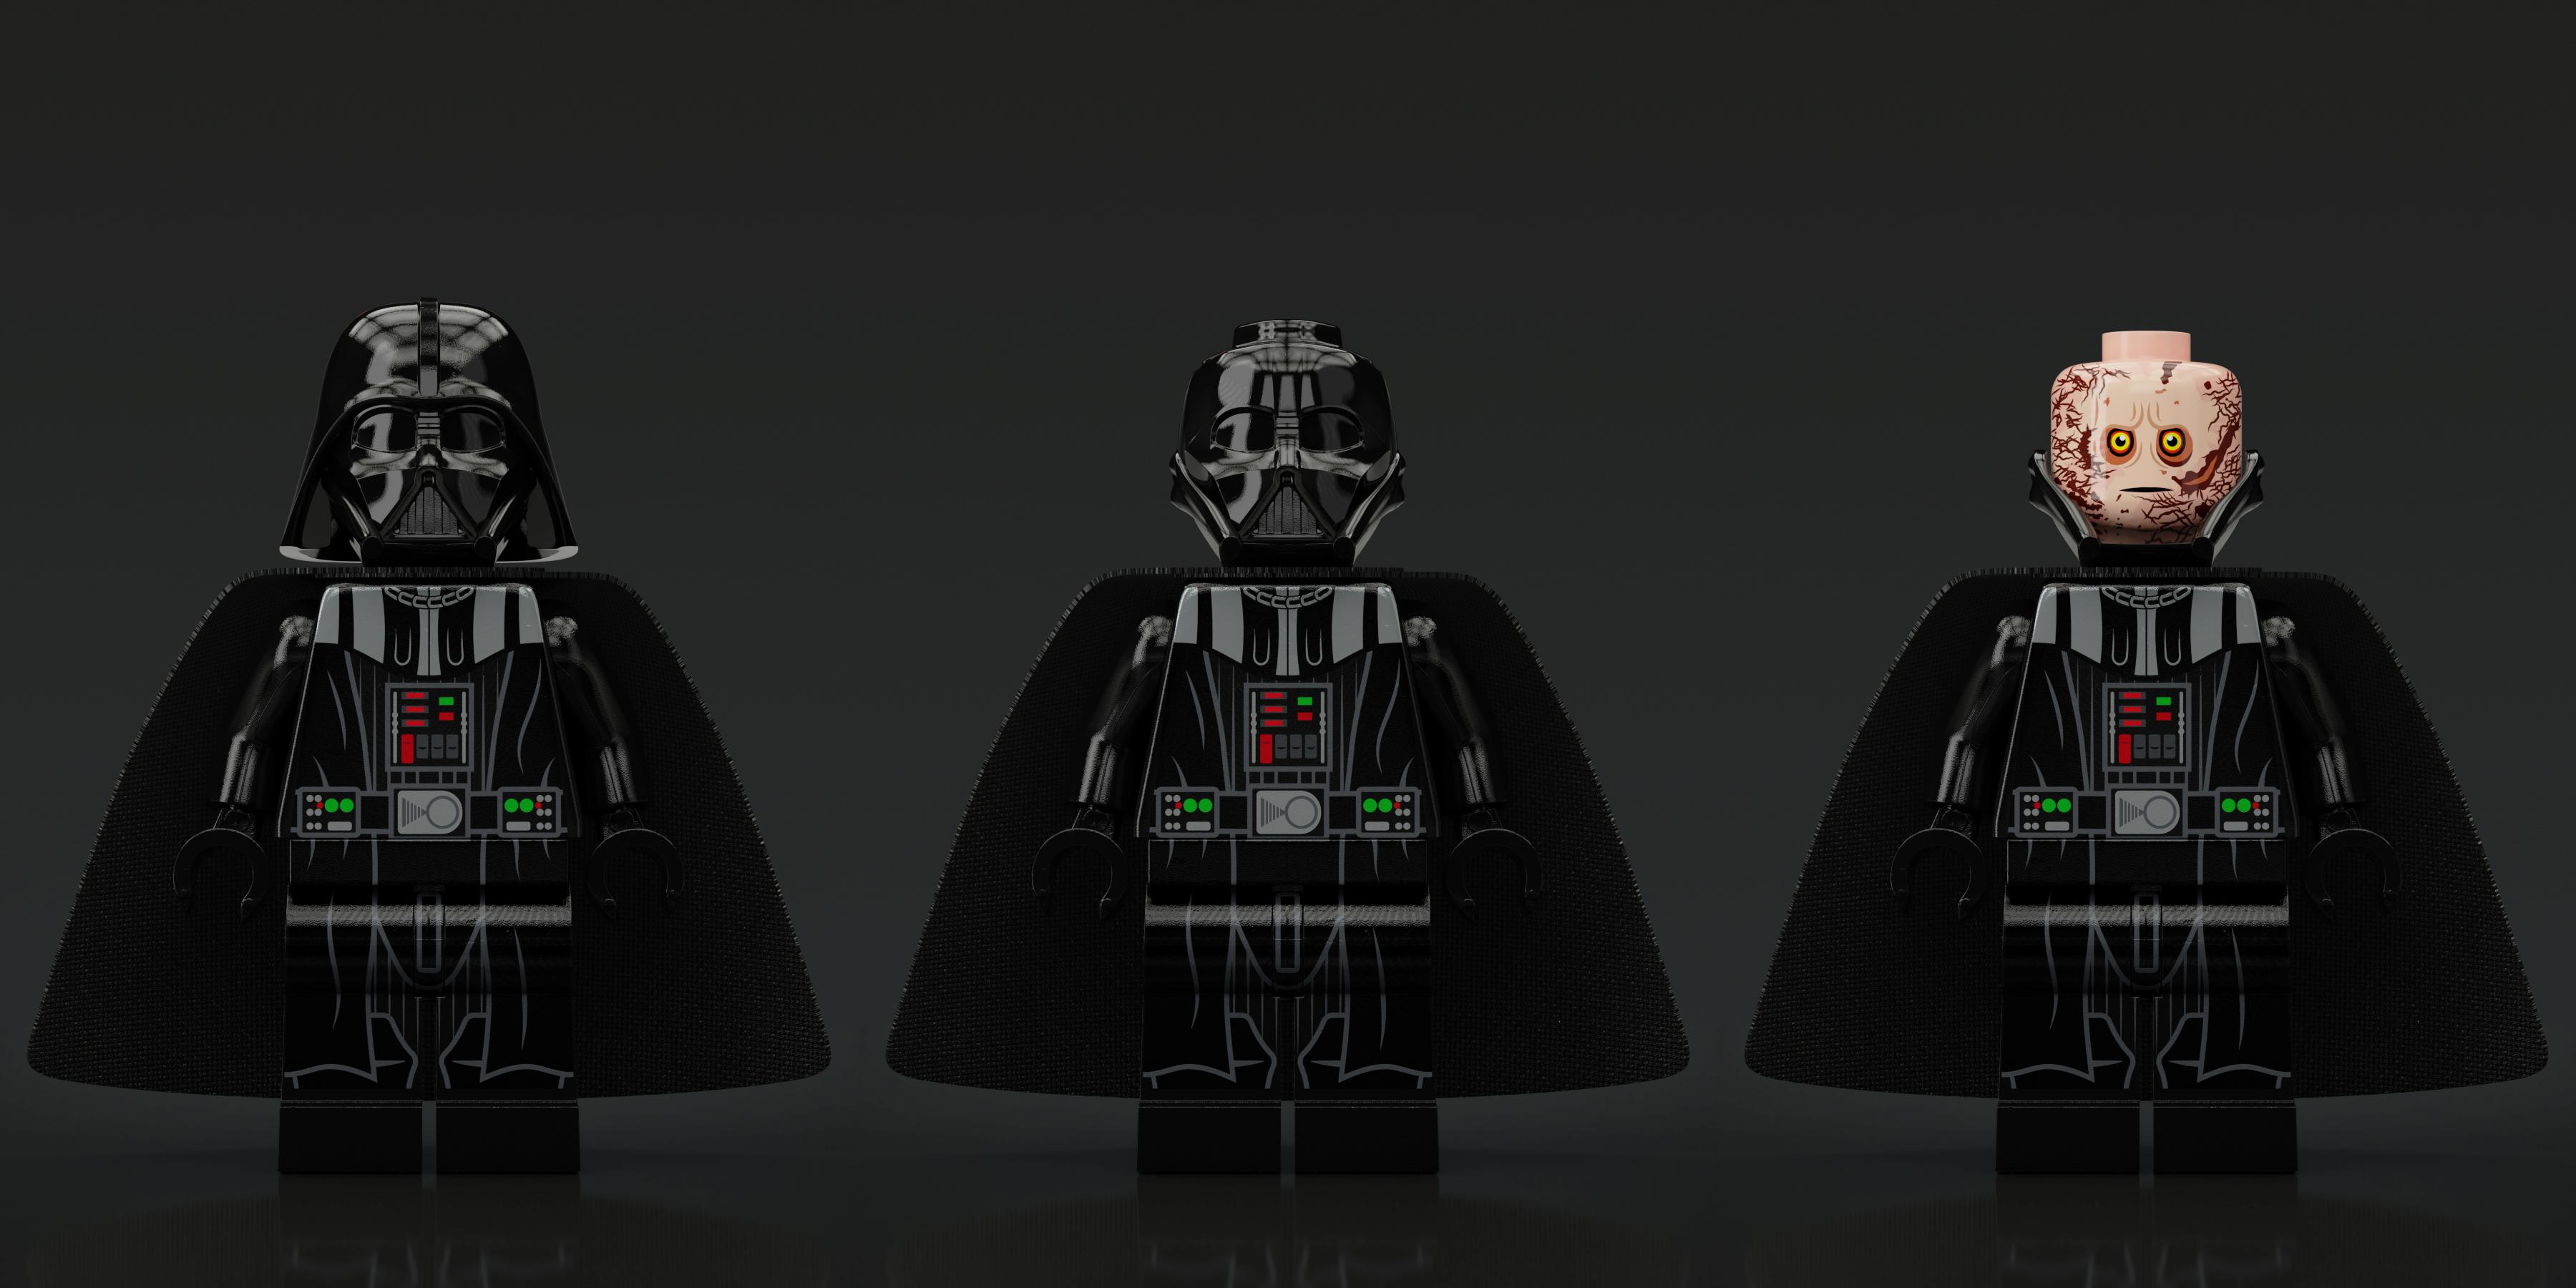 Lego Star Wars Darth Vader Hd Wallpaper Background Image